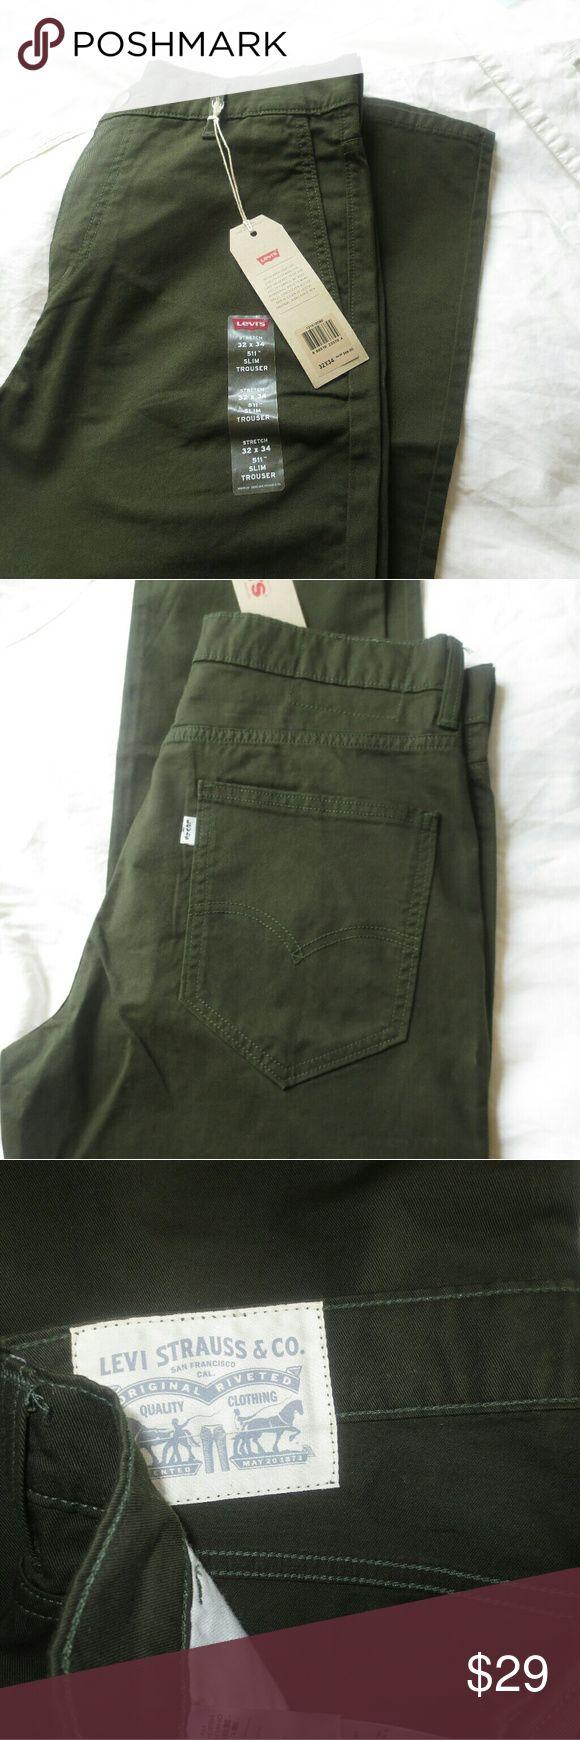 Levis 511 Slim Trouser Olive Color Twill Cotton Pants. Very stylish! Levi's Pants Chinos & Khakis